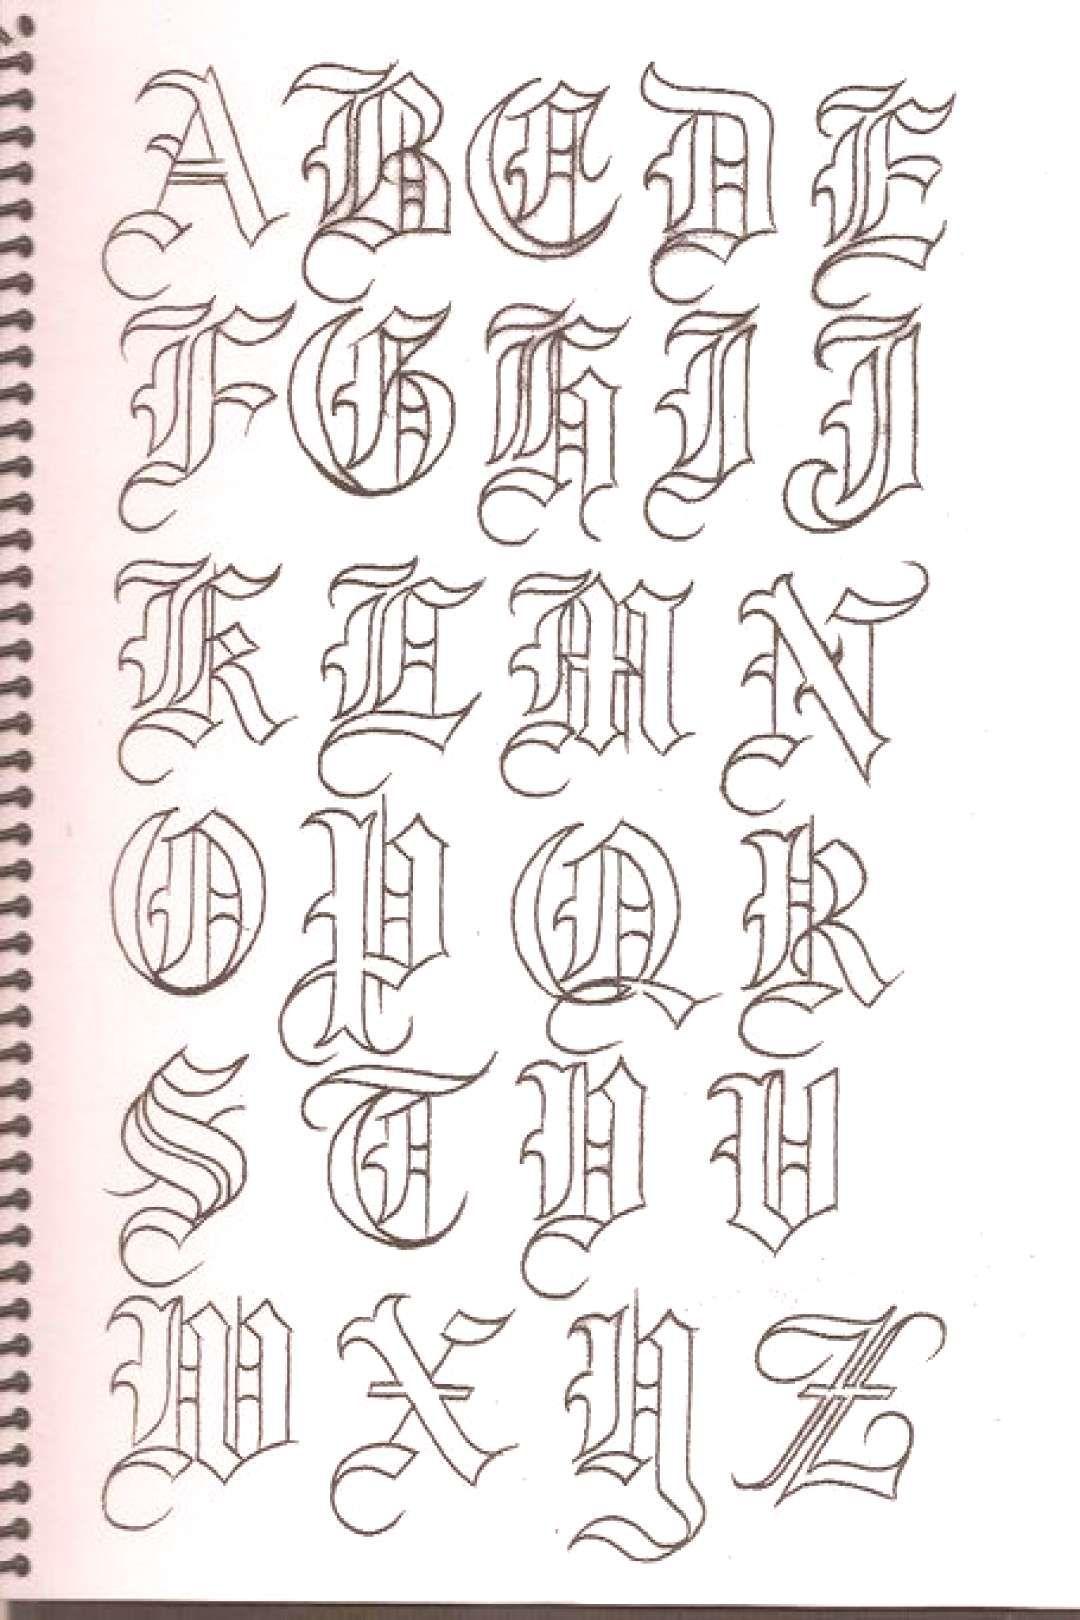 Caligrafía, abecedarios Caligrafía, abecedarios